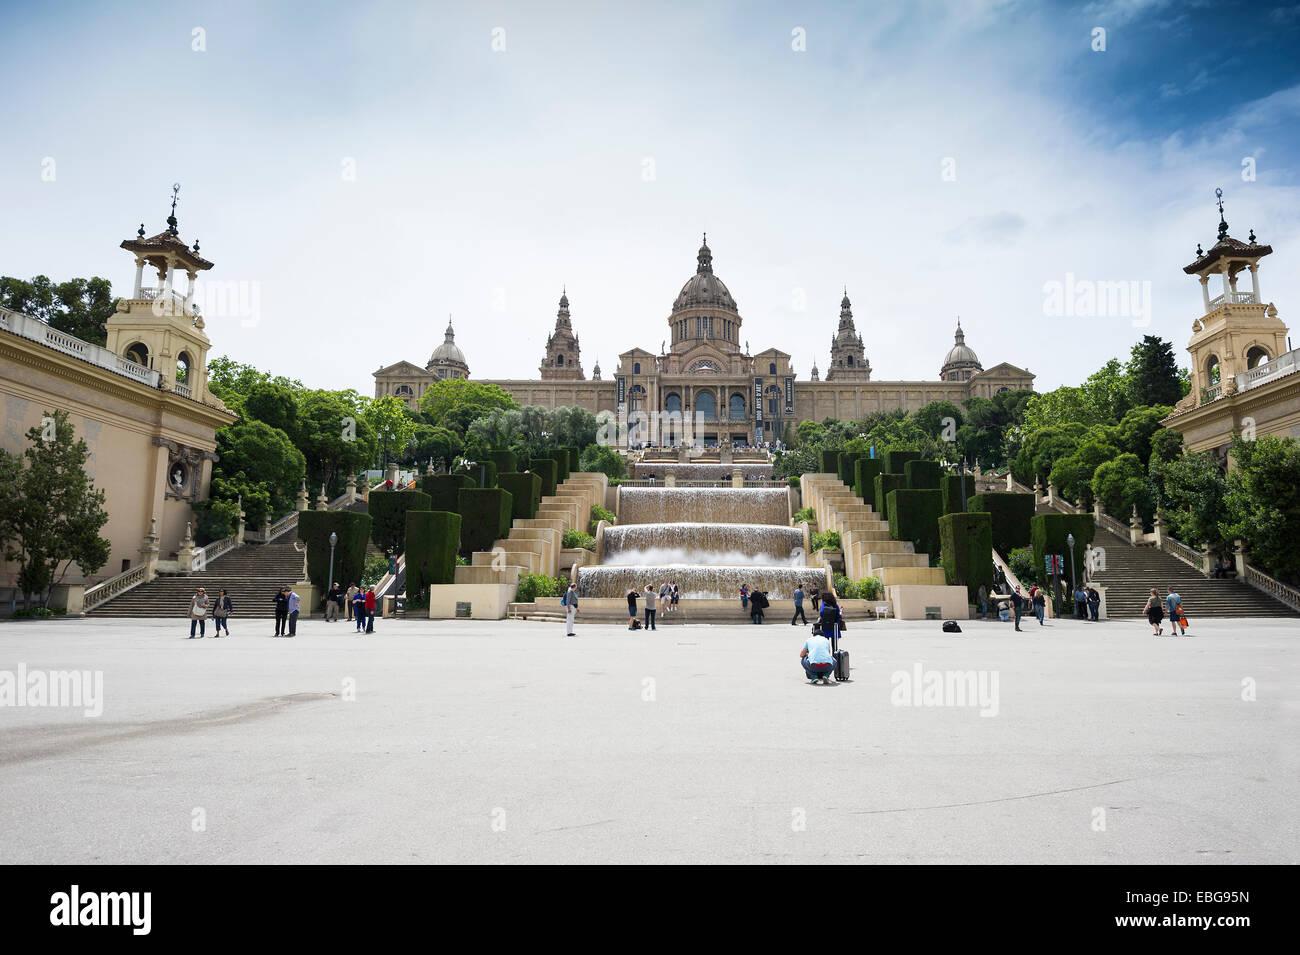 El Palacio National, le Musée National d&#39;Art de Catalunya, Barcelone, Catalogne, Espagne Photo Stock